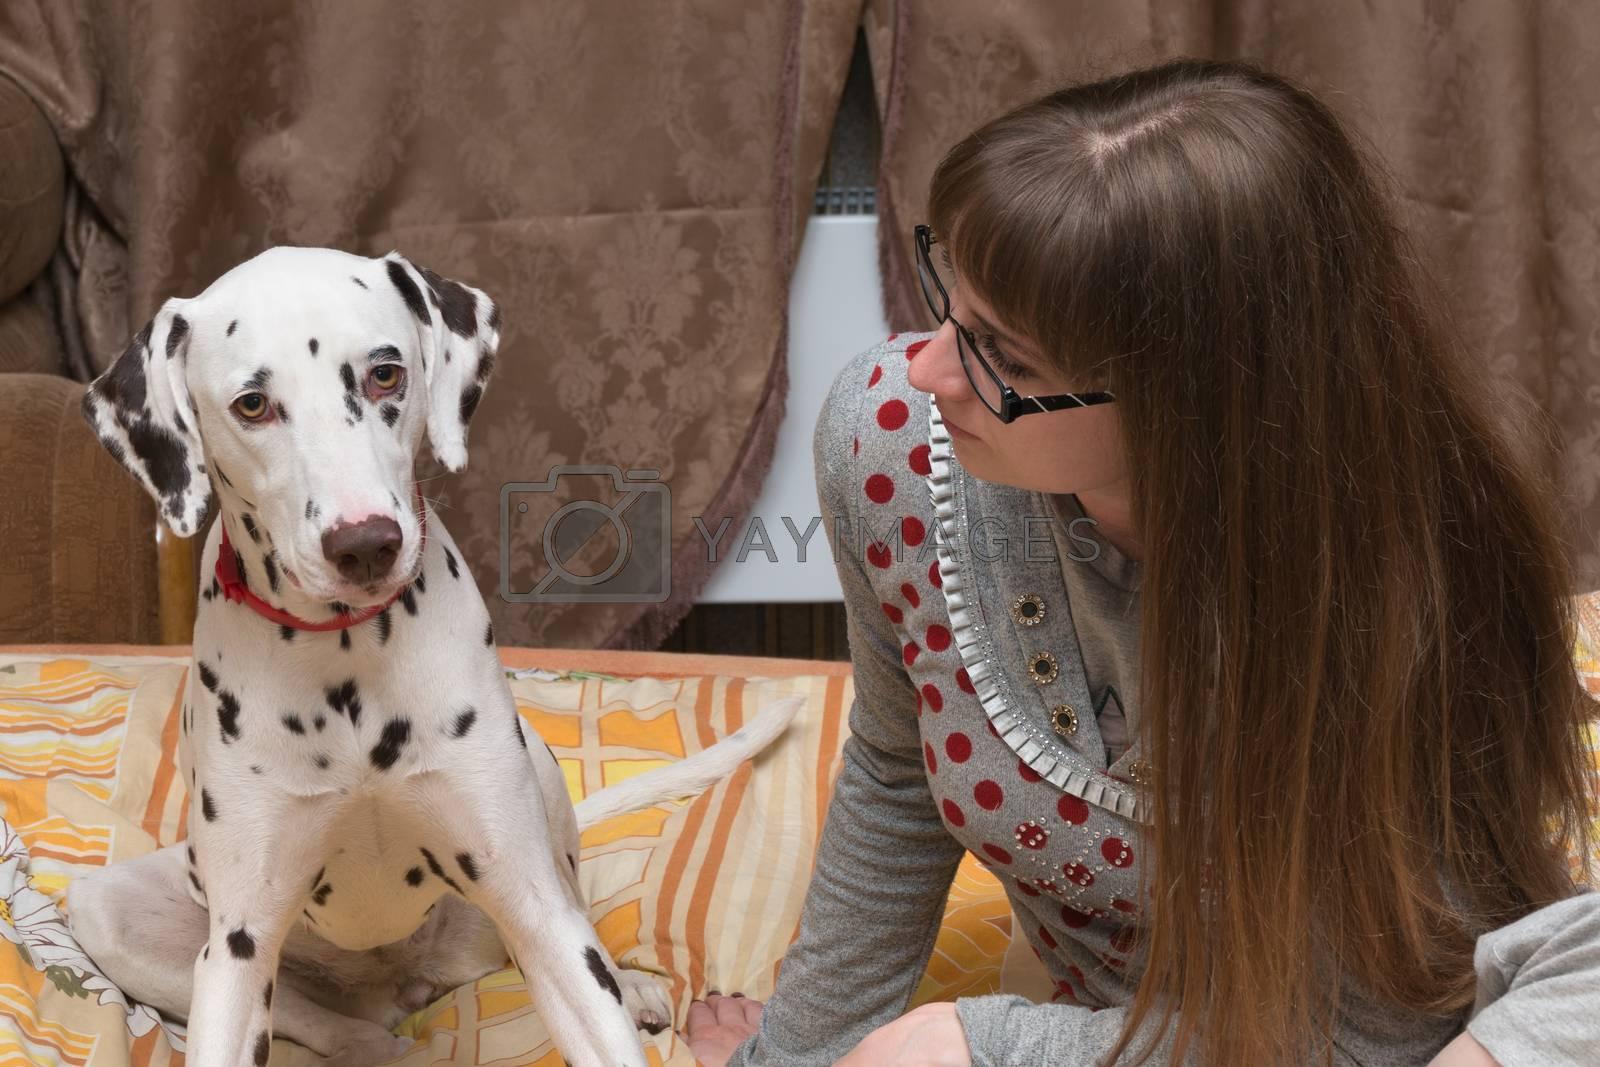 The girl talks to a dalmatian